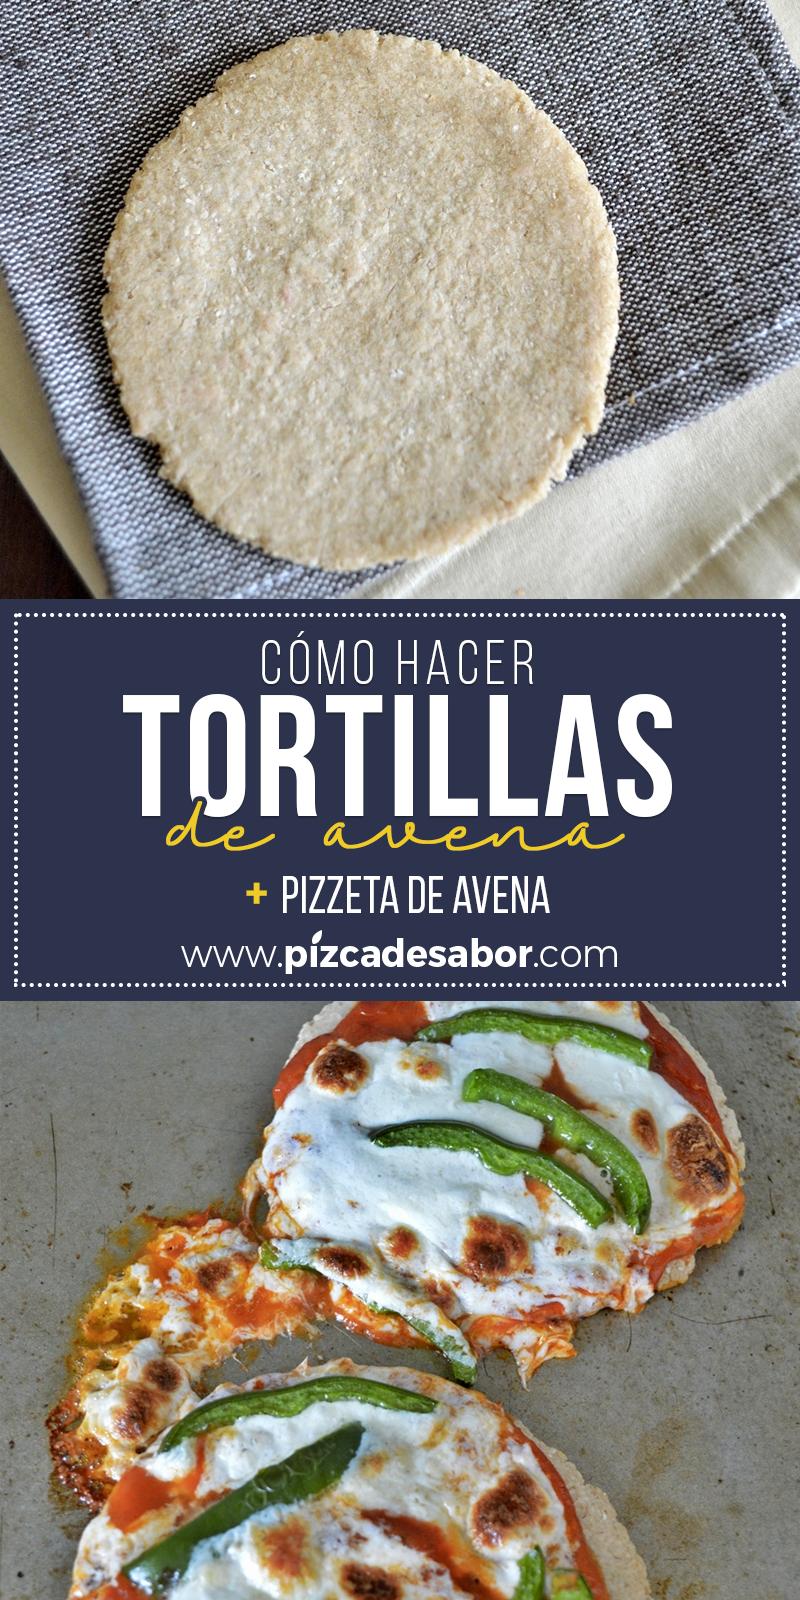 de avena + Pizzeta de avena (pizza saludable) Cómo hacer tortillas de avena + pizzeta de avena.Cómo hacer tortillas de avena + pizzeta de avena.